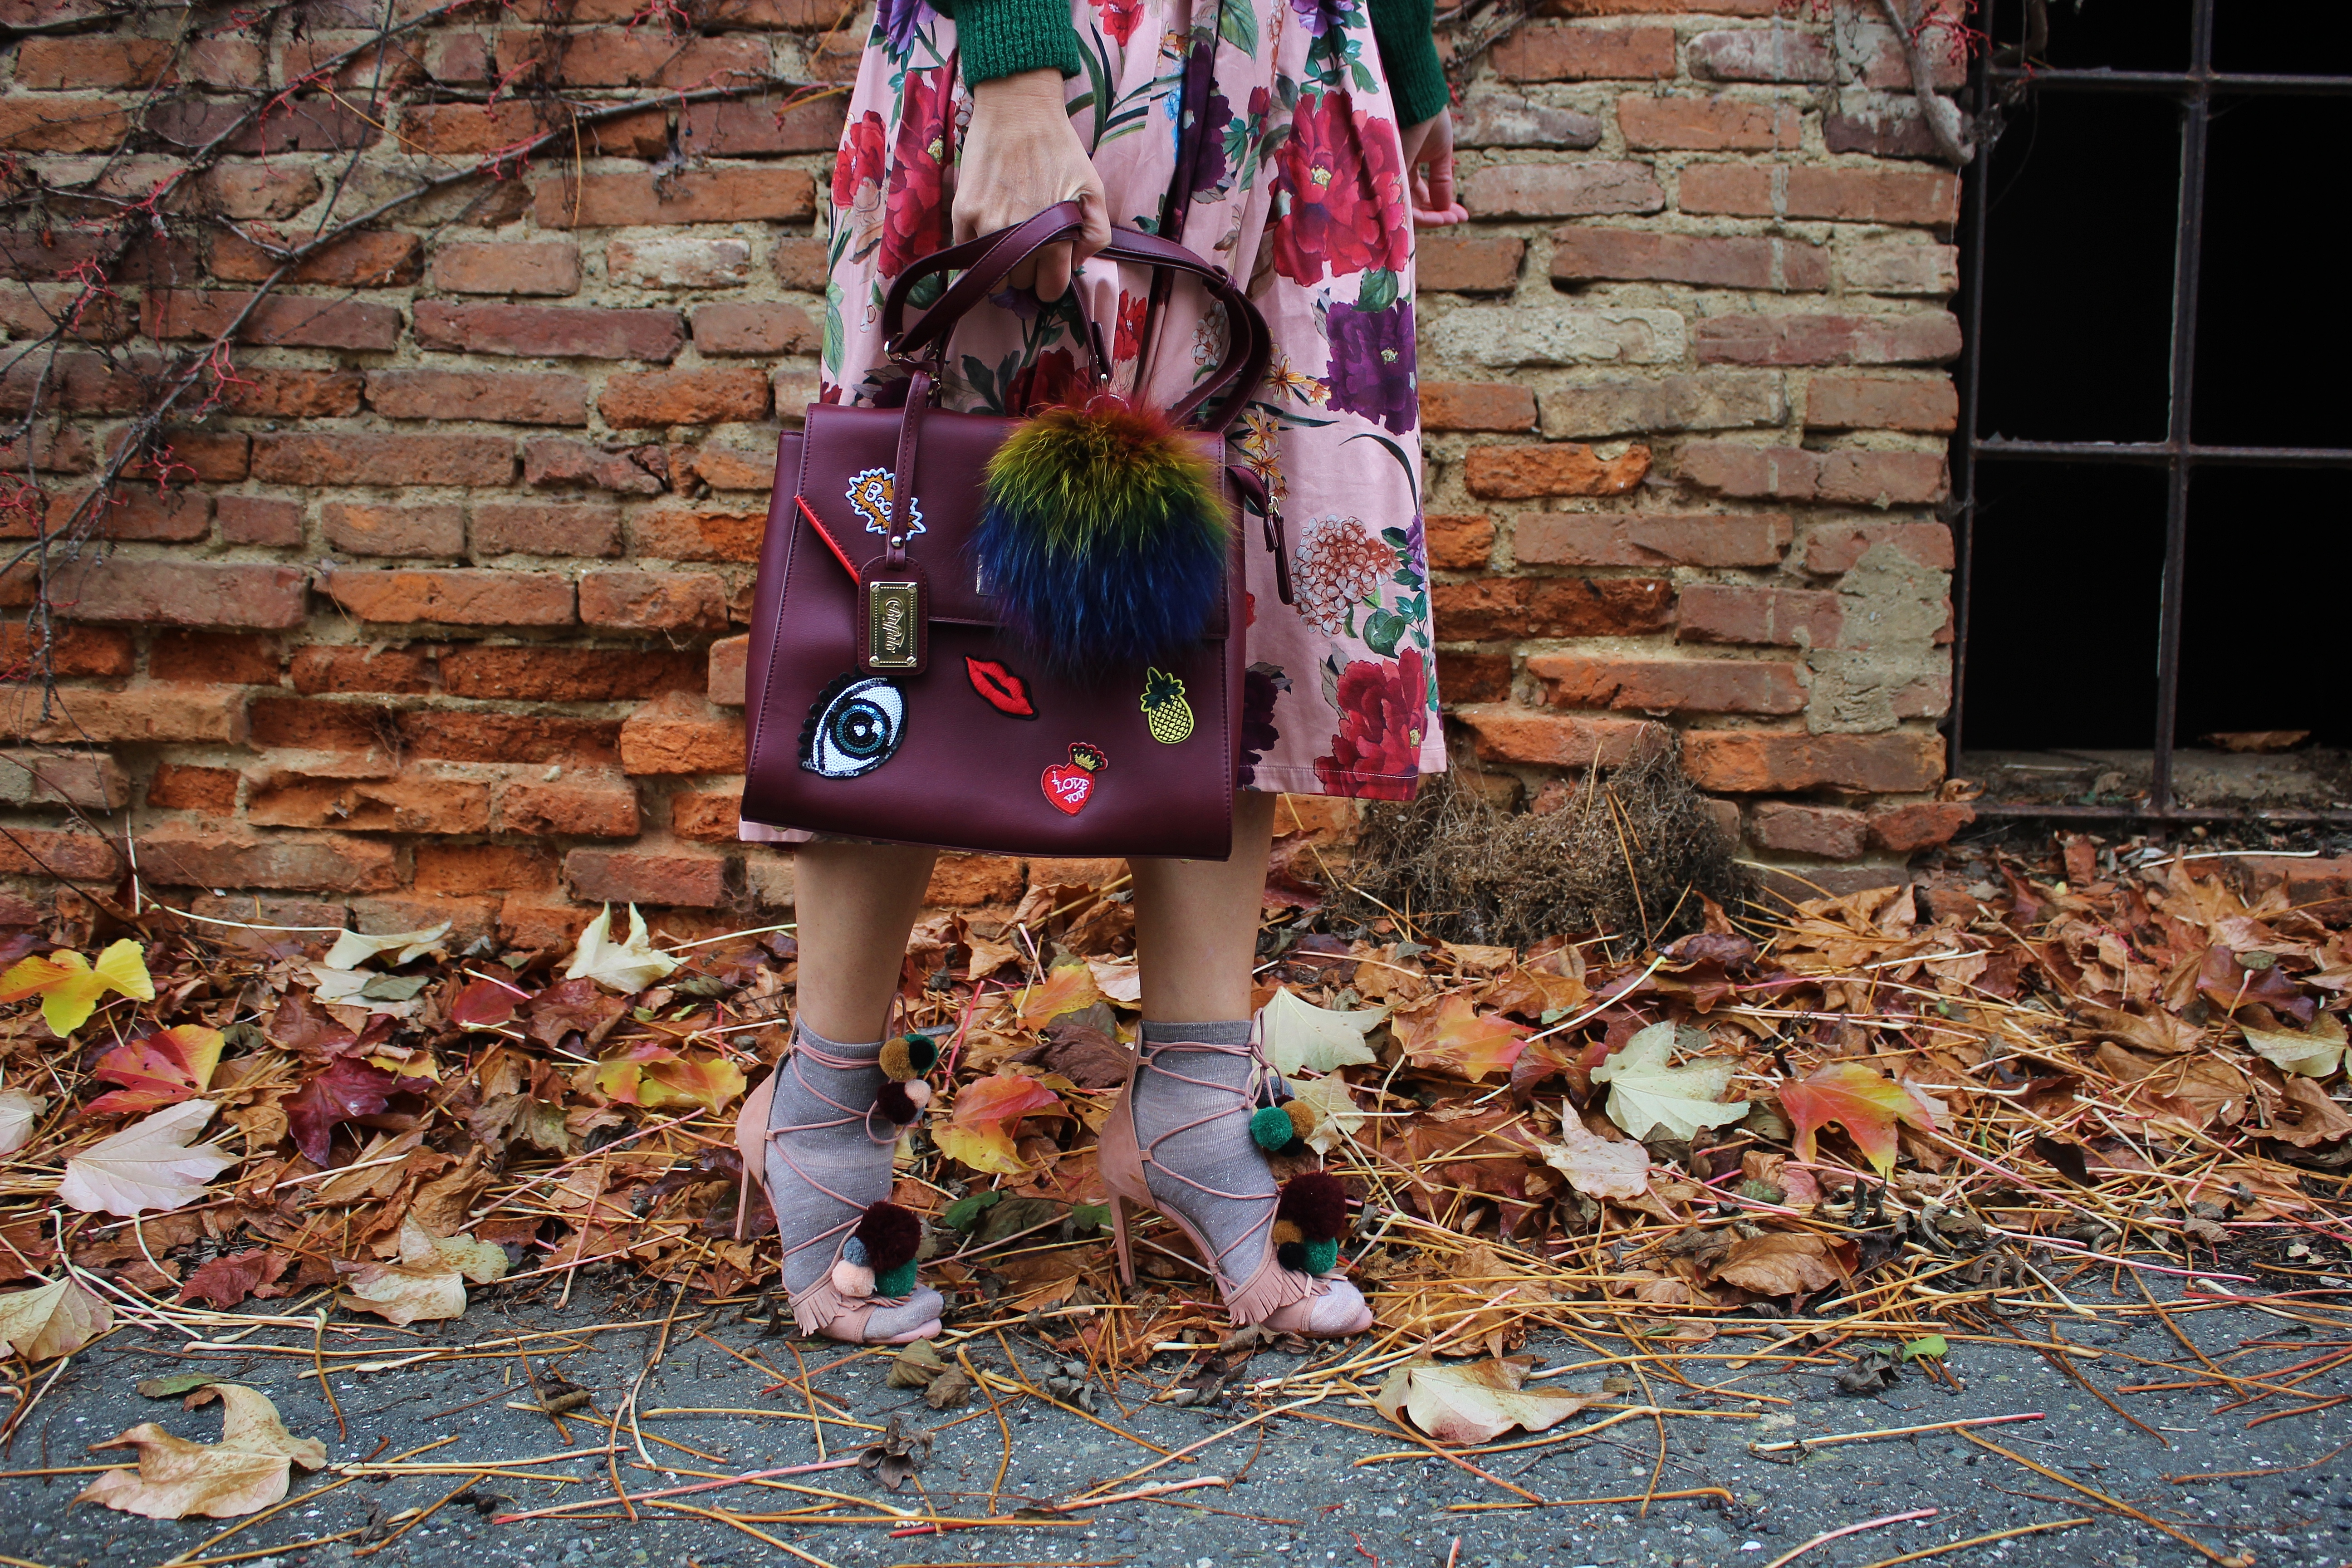 Highheels-Sandalen-Socken-Fashionsocks-Summer-Skirt-Floralprint-Green-Jumper-carrieslifestyle-Sommersachen-im-Herbst-Tamara-Prutsch